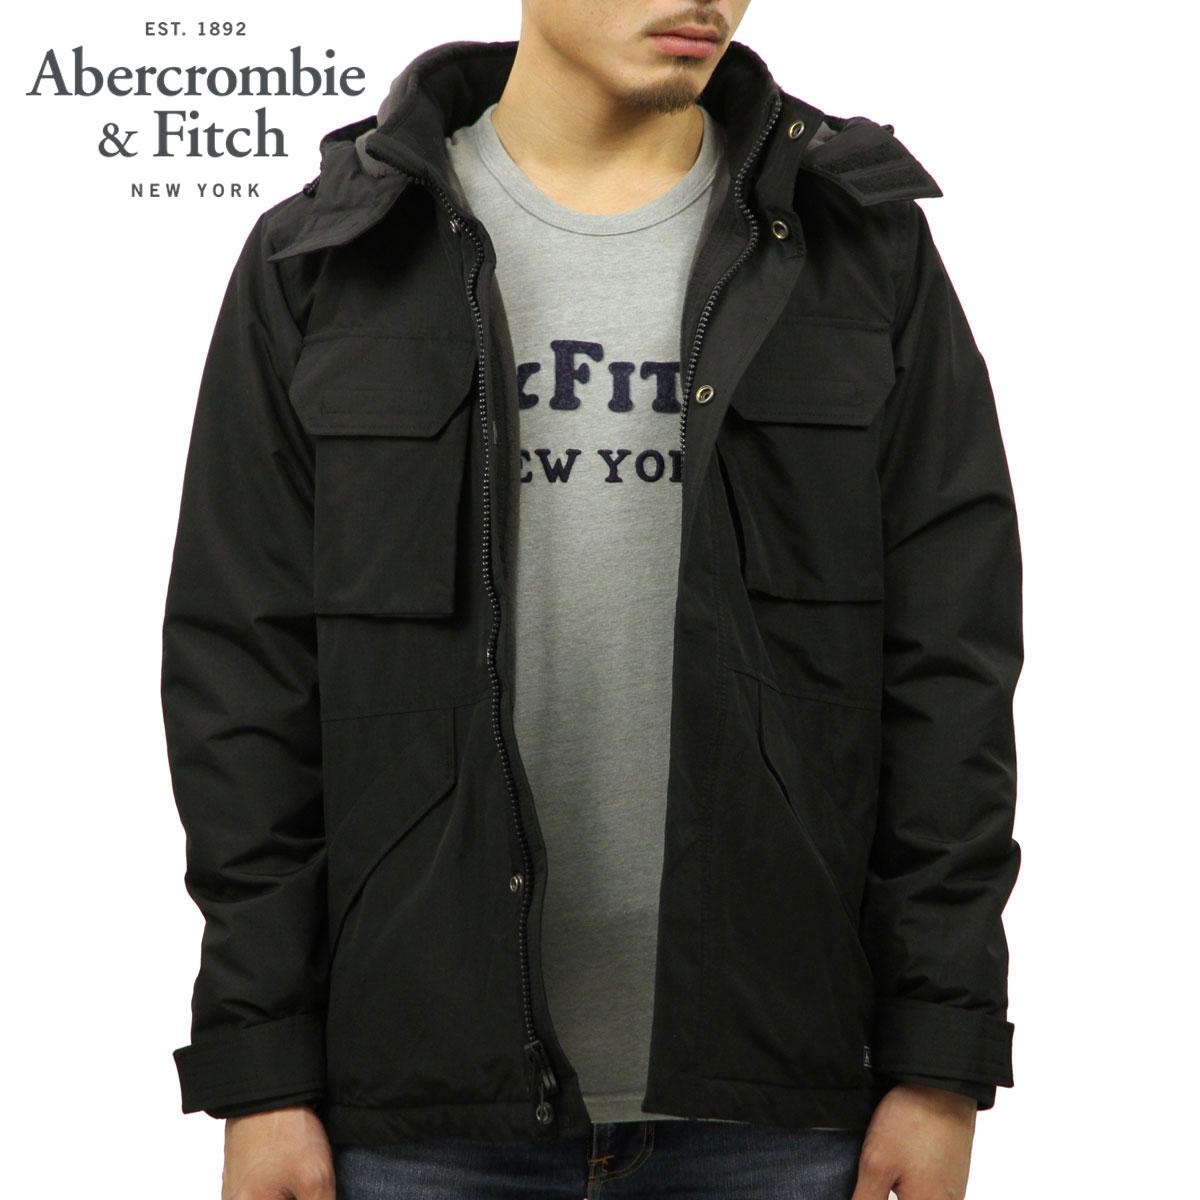 cc31e1729 ABBA black jacket men's regular article Abercrombie & Fitch nylon jacket  MIDWEIGHT TECHNICAL JACKET 132-328-1234-900